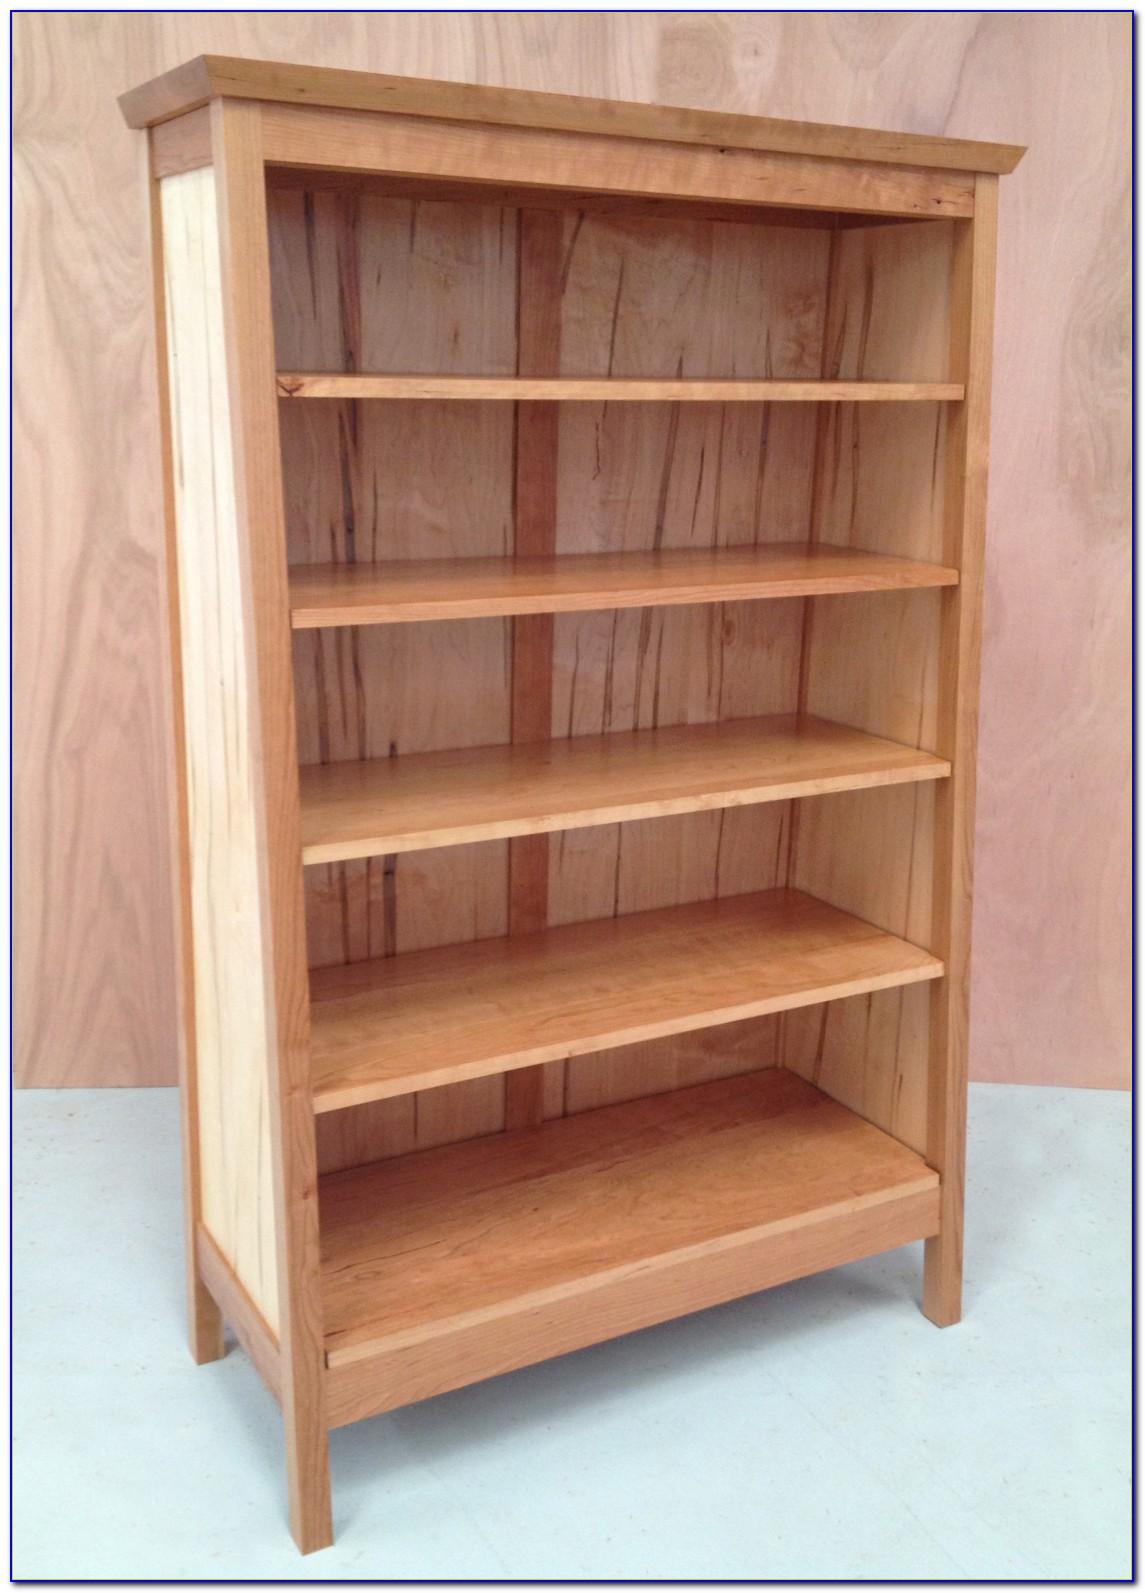 How To Make A Simple Bookshelf